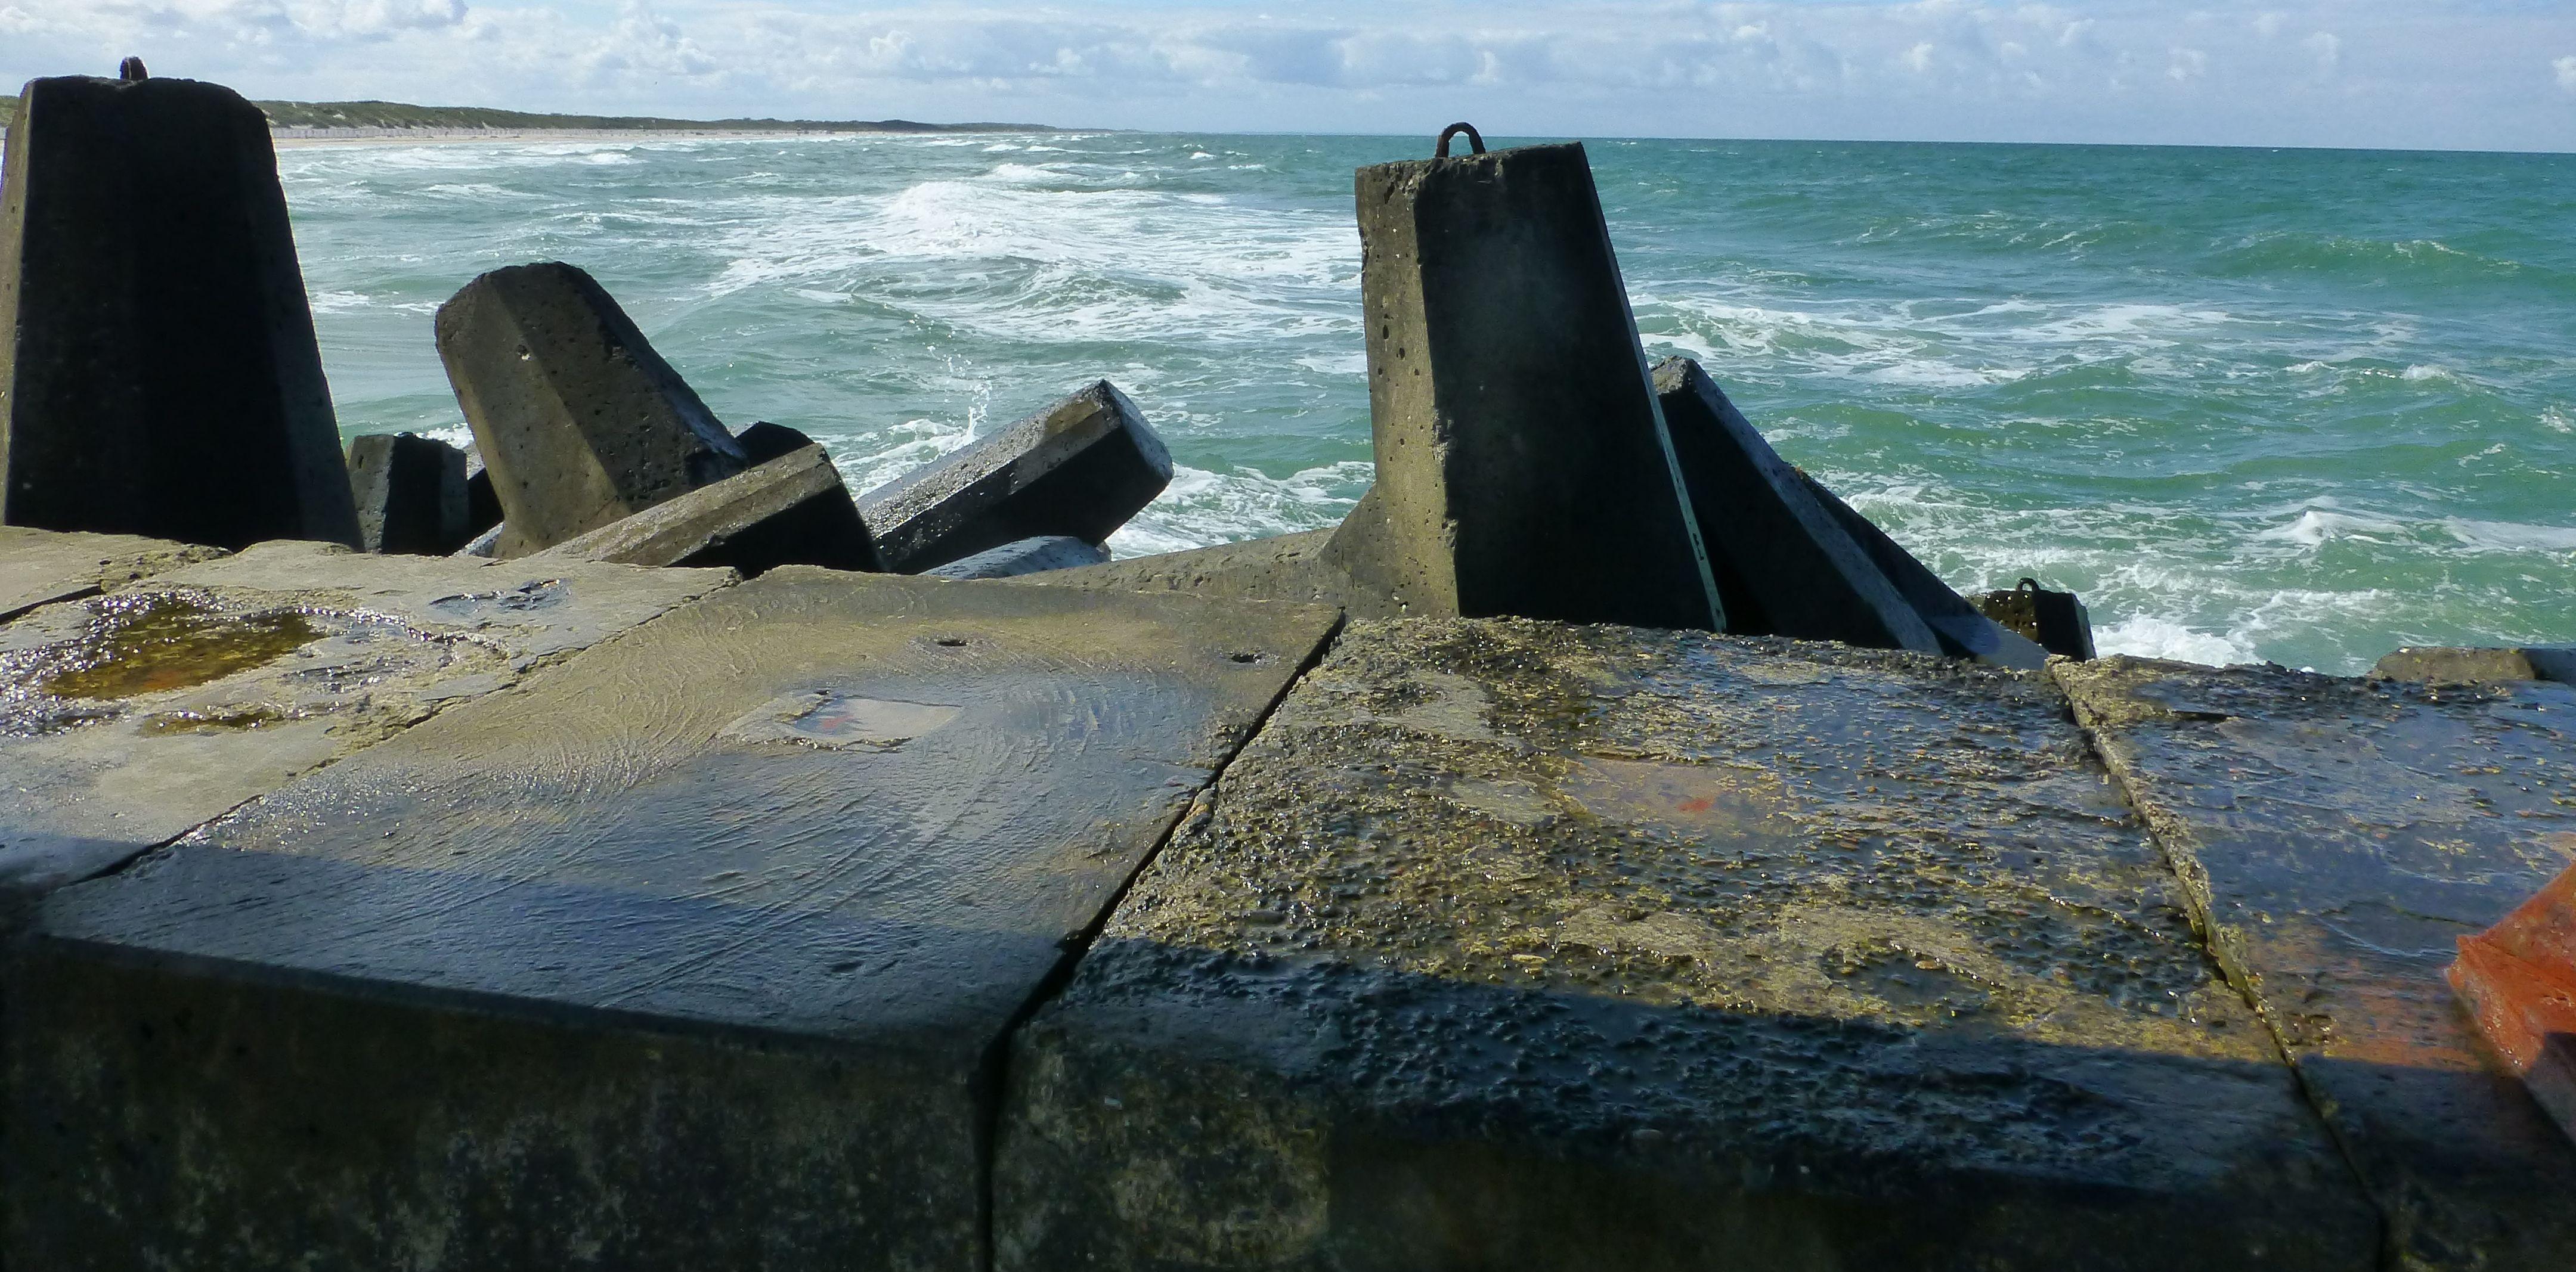 Fra Vesterhavet Mine Egne Malerier Og Fotos Malerier Og Fotos